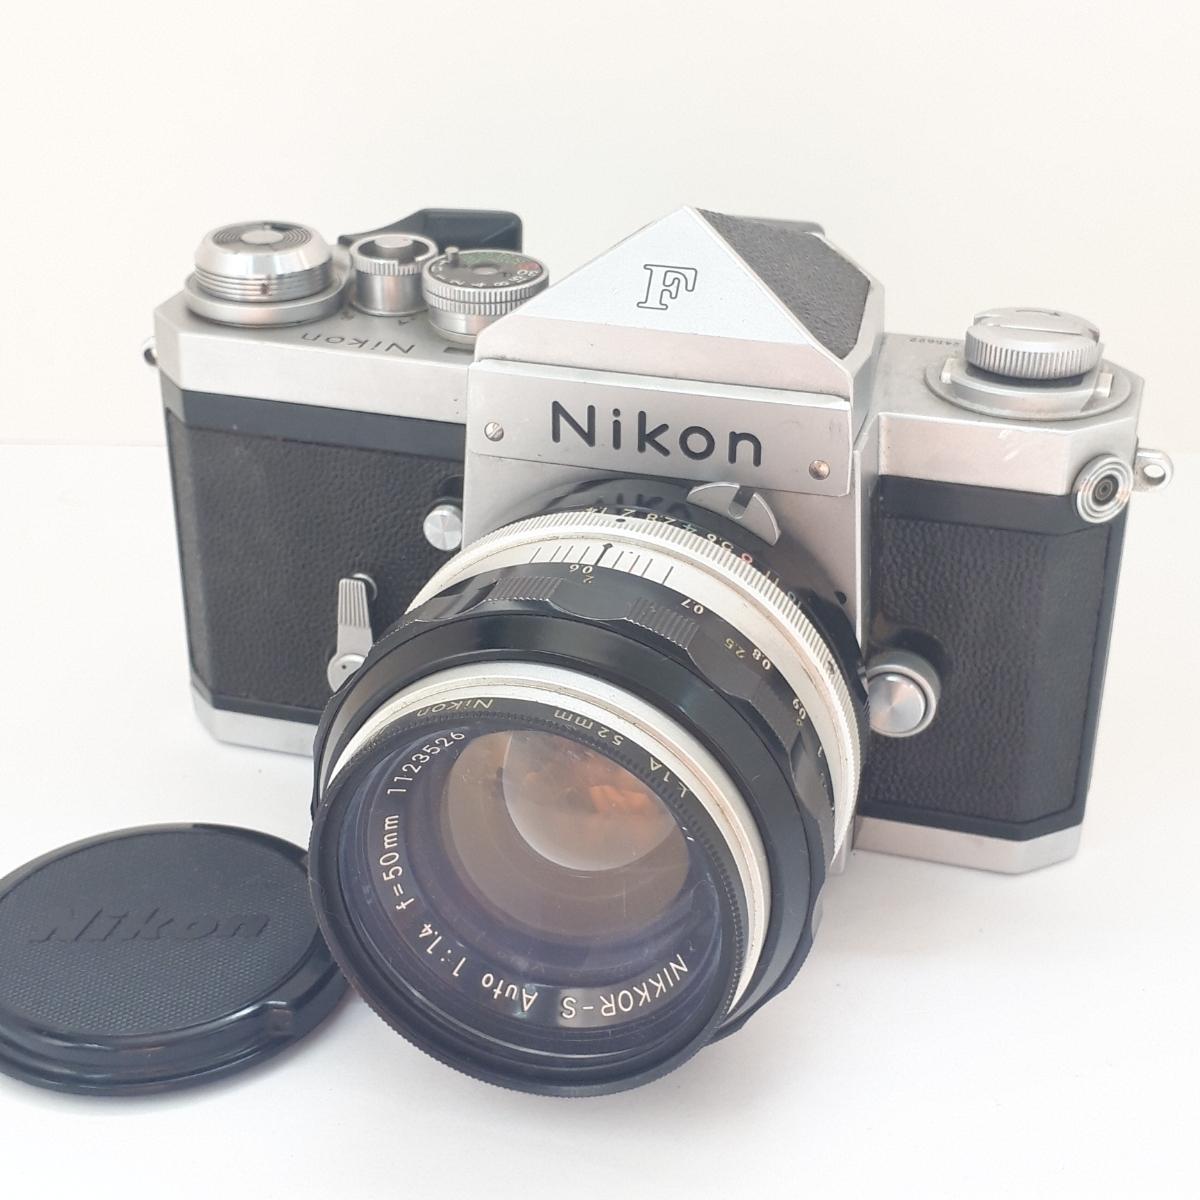 ★NIKON ニコン F NIKKOR-S 1:1.4 50mm 一眼レフカメラ レンズ★